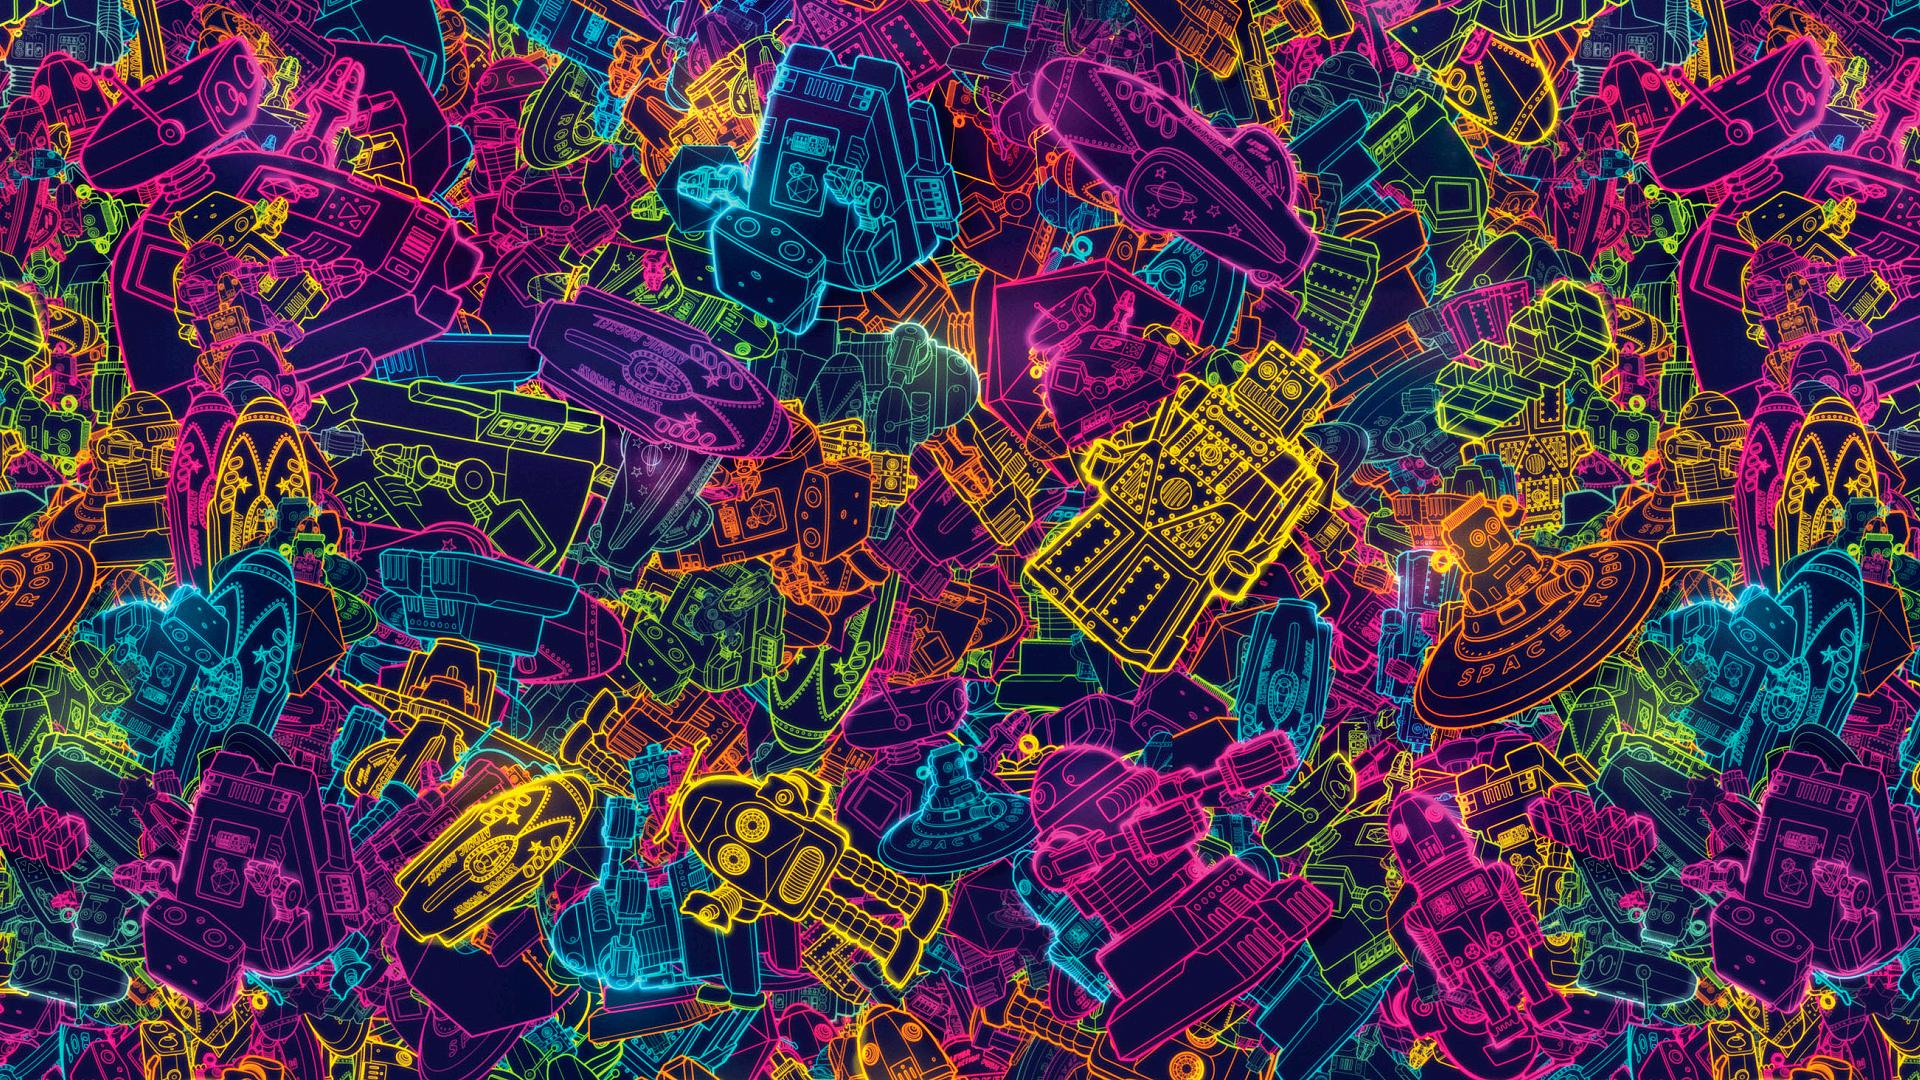 Retro Robot Wallpaper Backgrounds 1920x1080